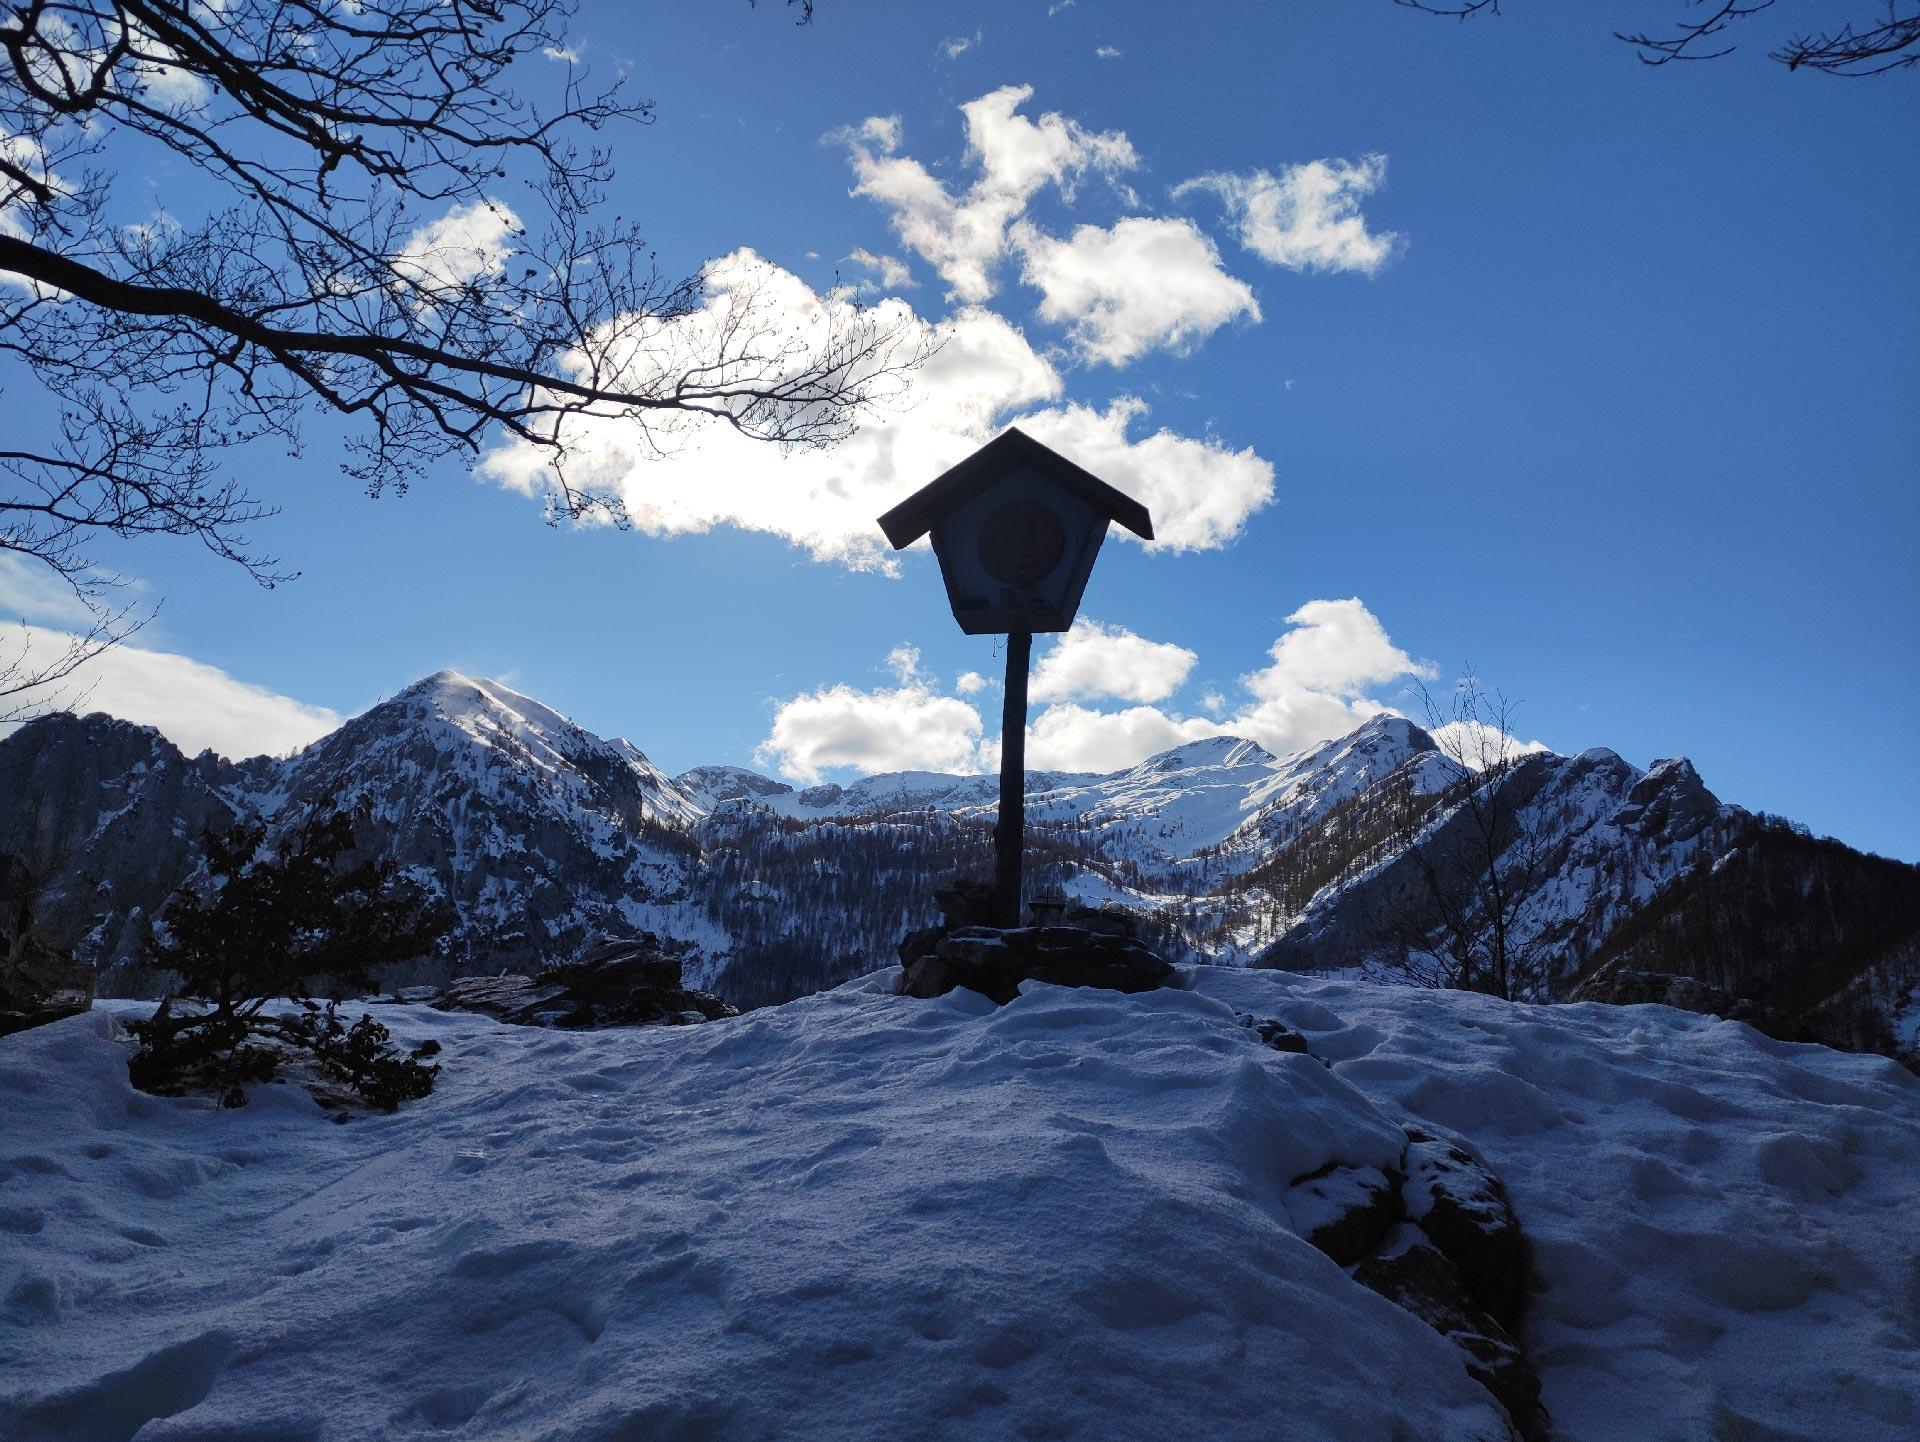 Trekking invernali in Valsassina: panorama sul Grignone